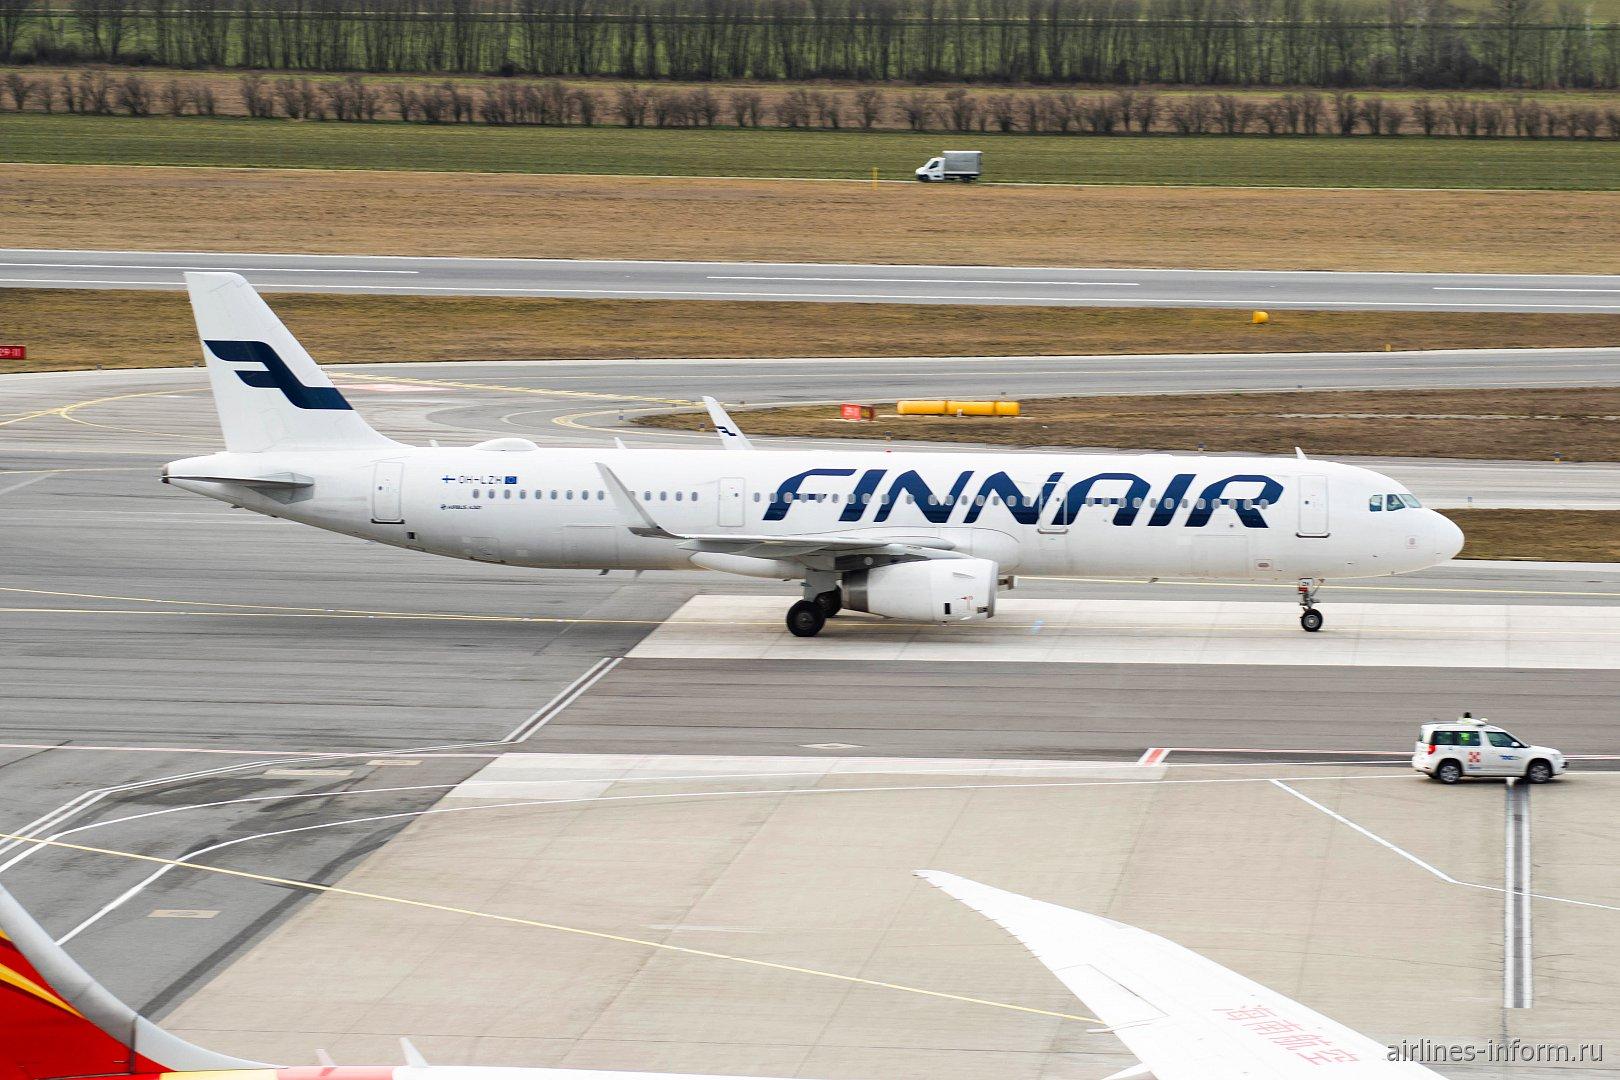 Самолет Airbus A321 (OH-LZH) авиакомпании Finnair в аэропорту Вены